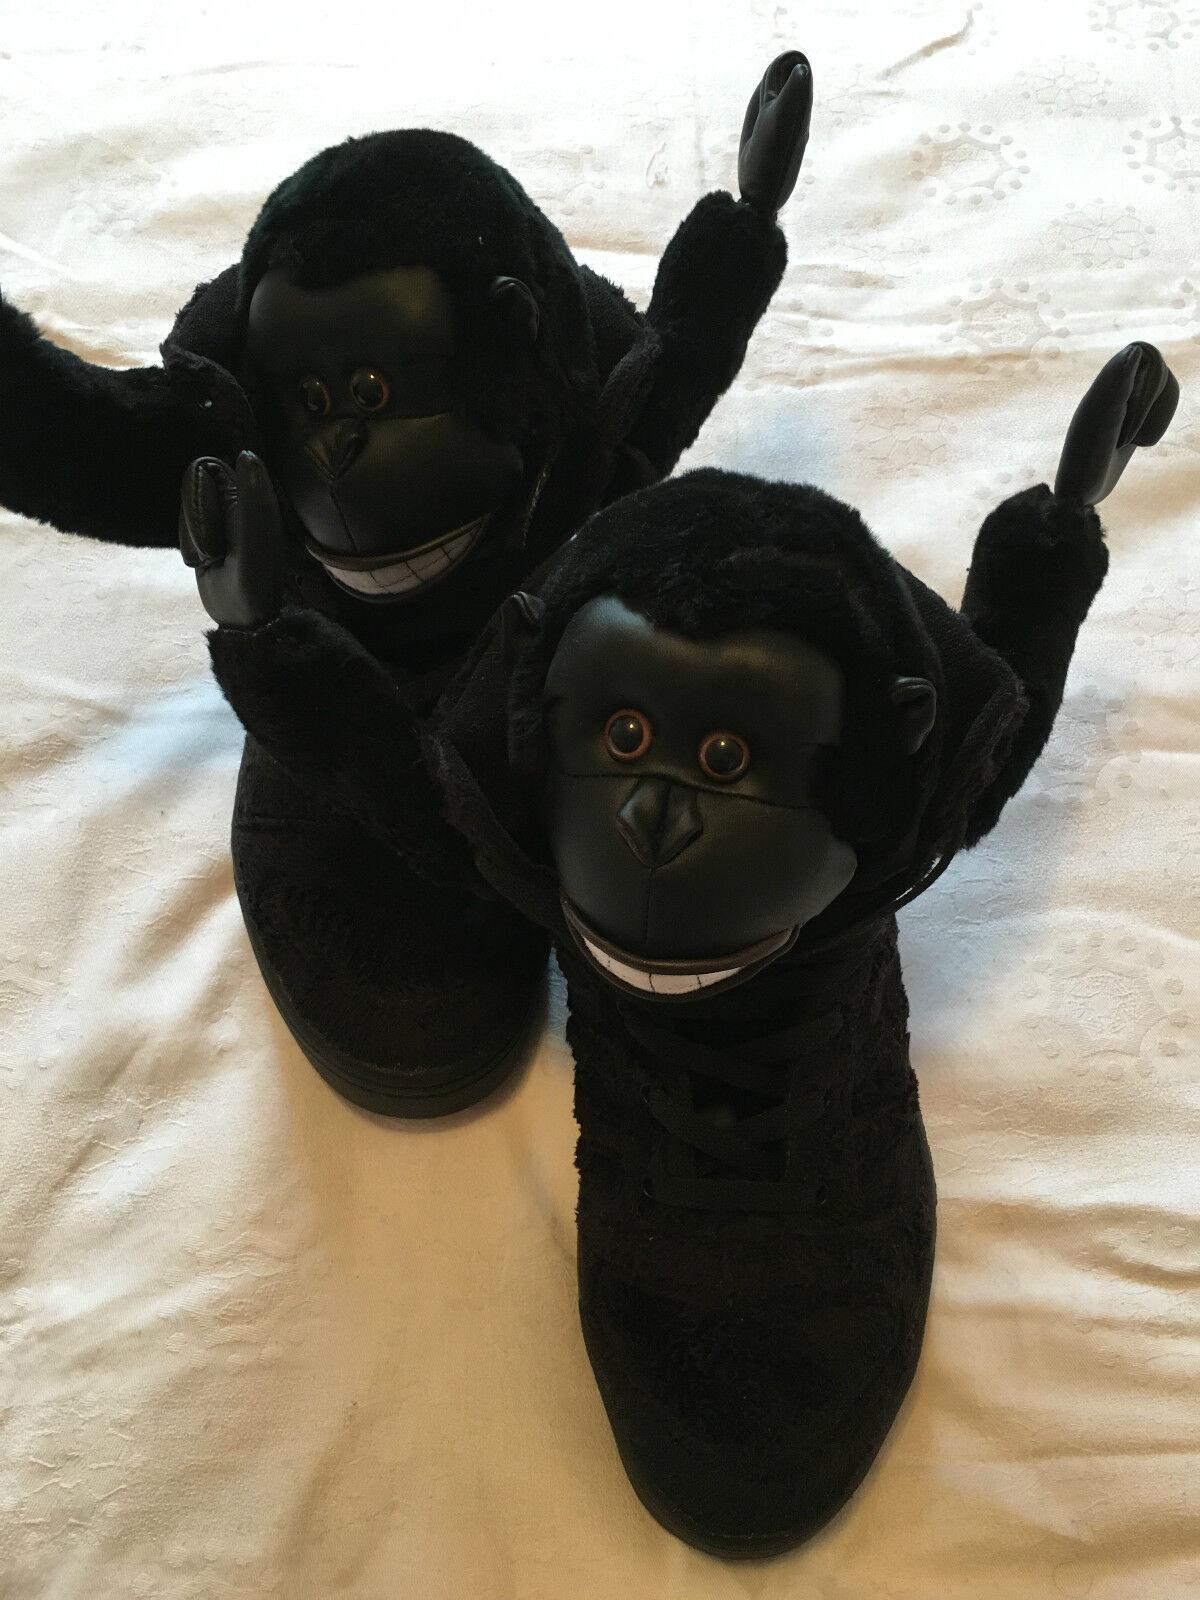 Adidas Originals Jeremy Scott Hi & amp;JS Gorilla πάνινα παπούτσια μΡγέθους 11,5